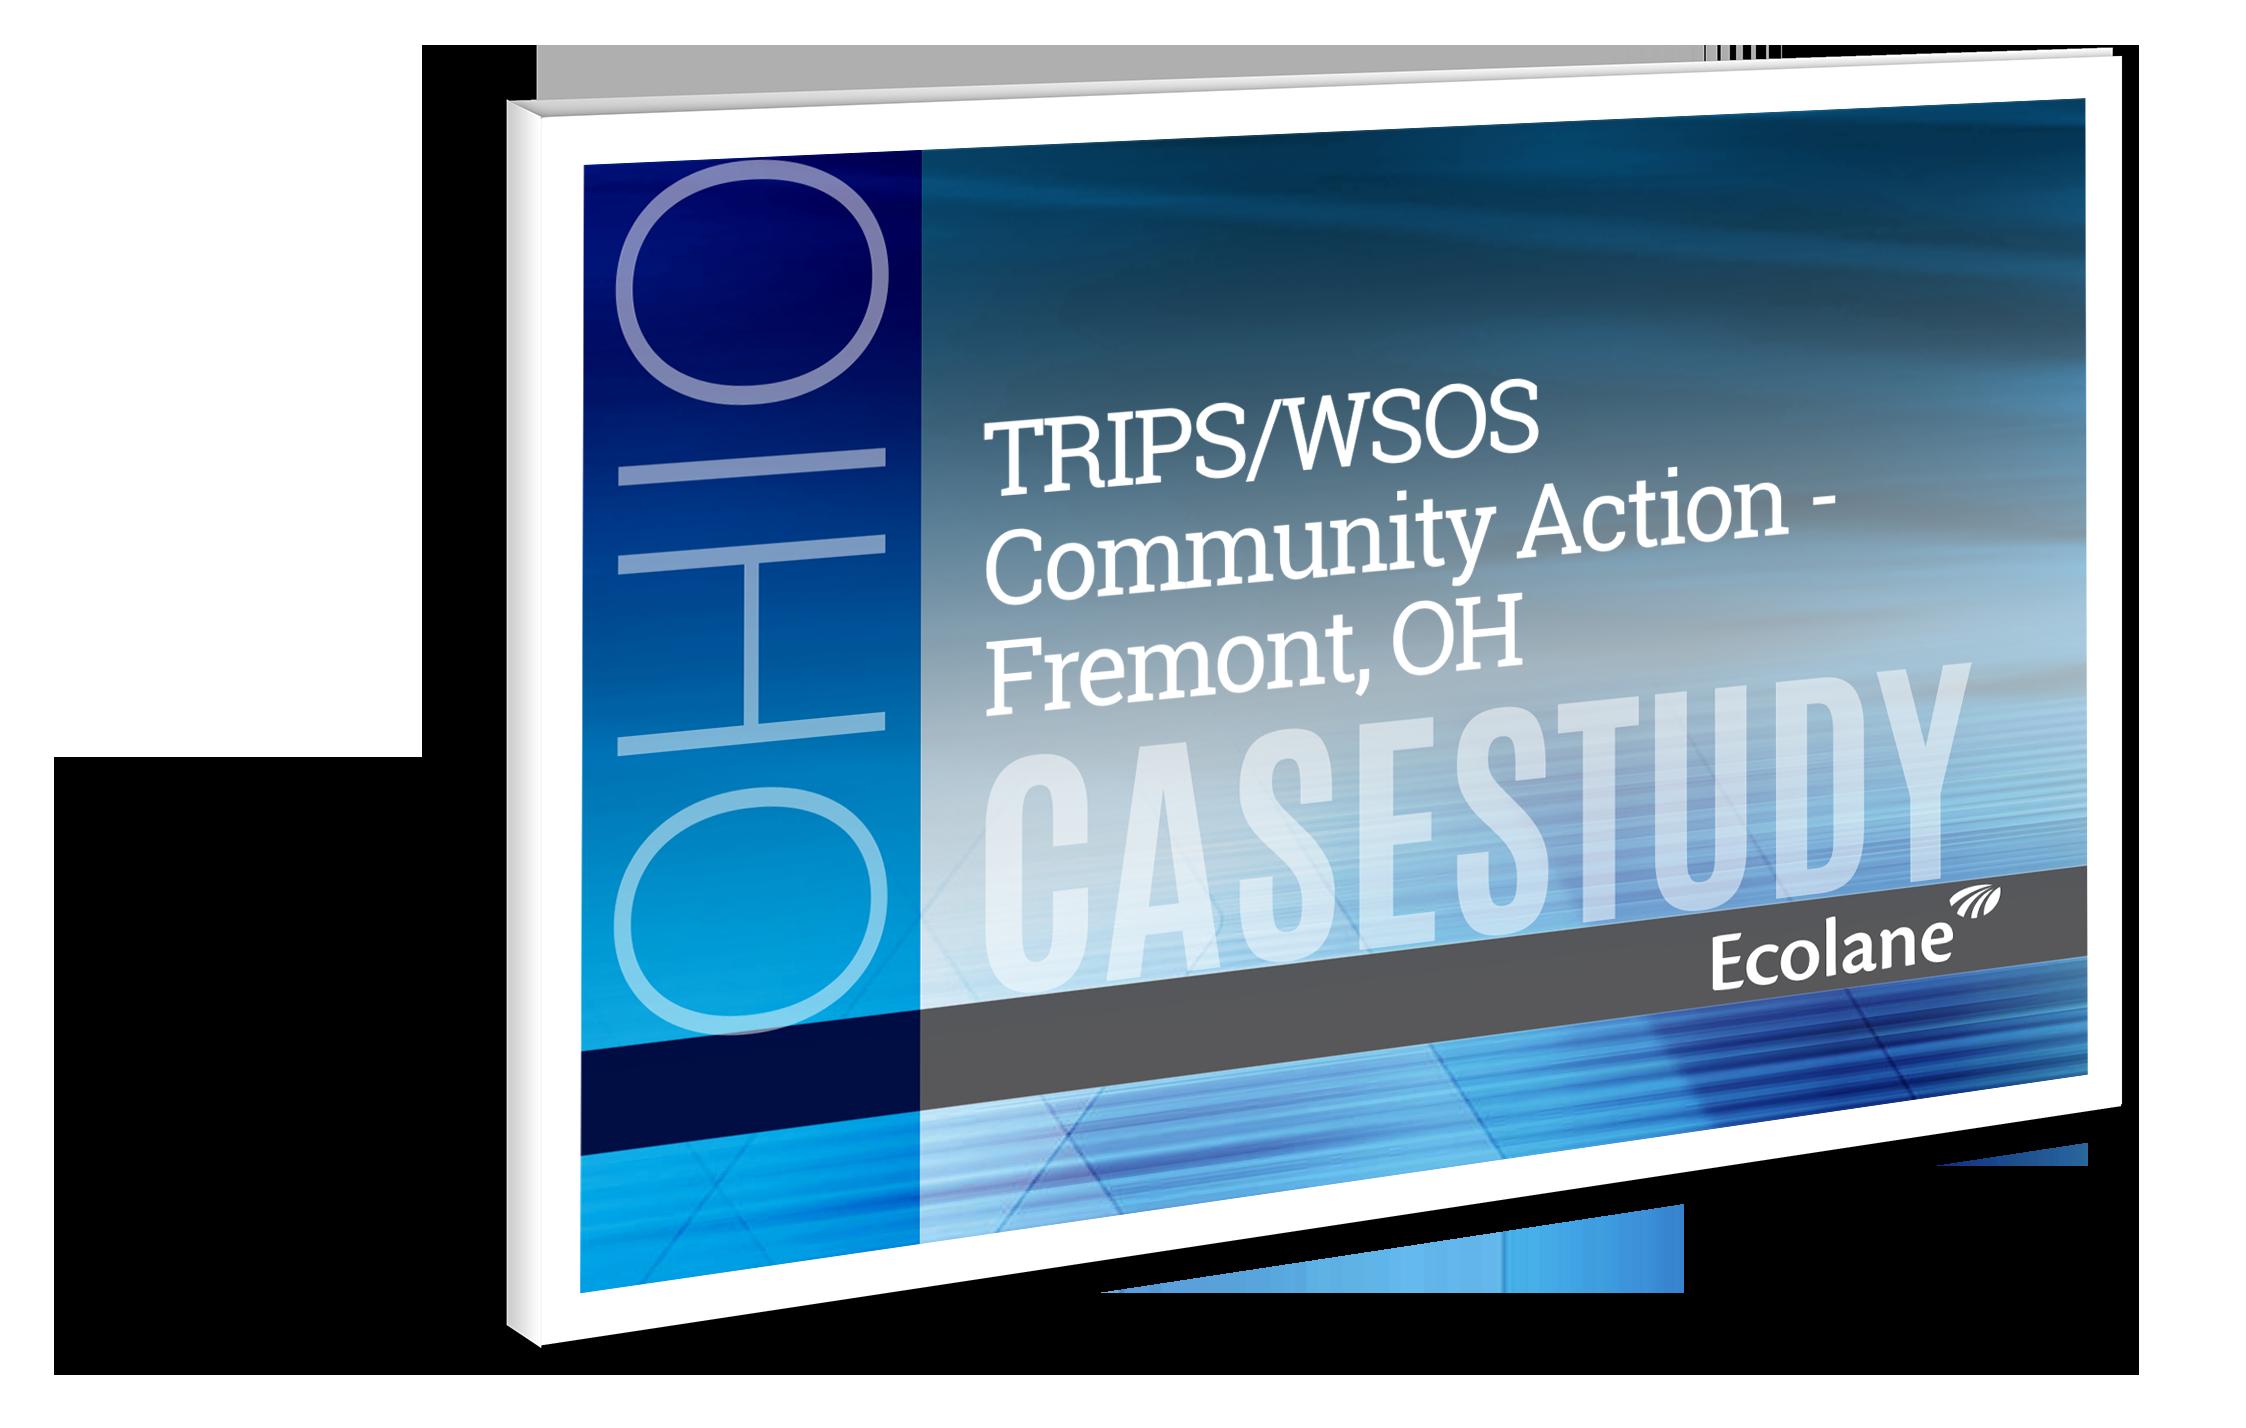 TRIPS/WSOS